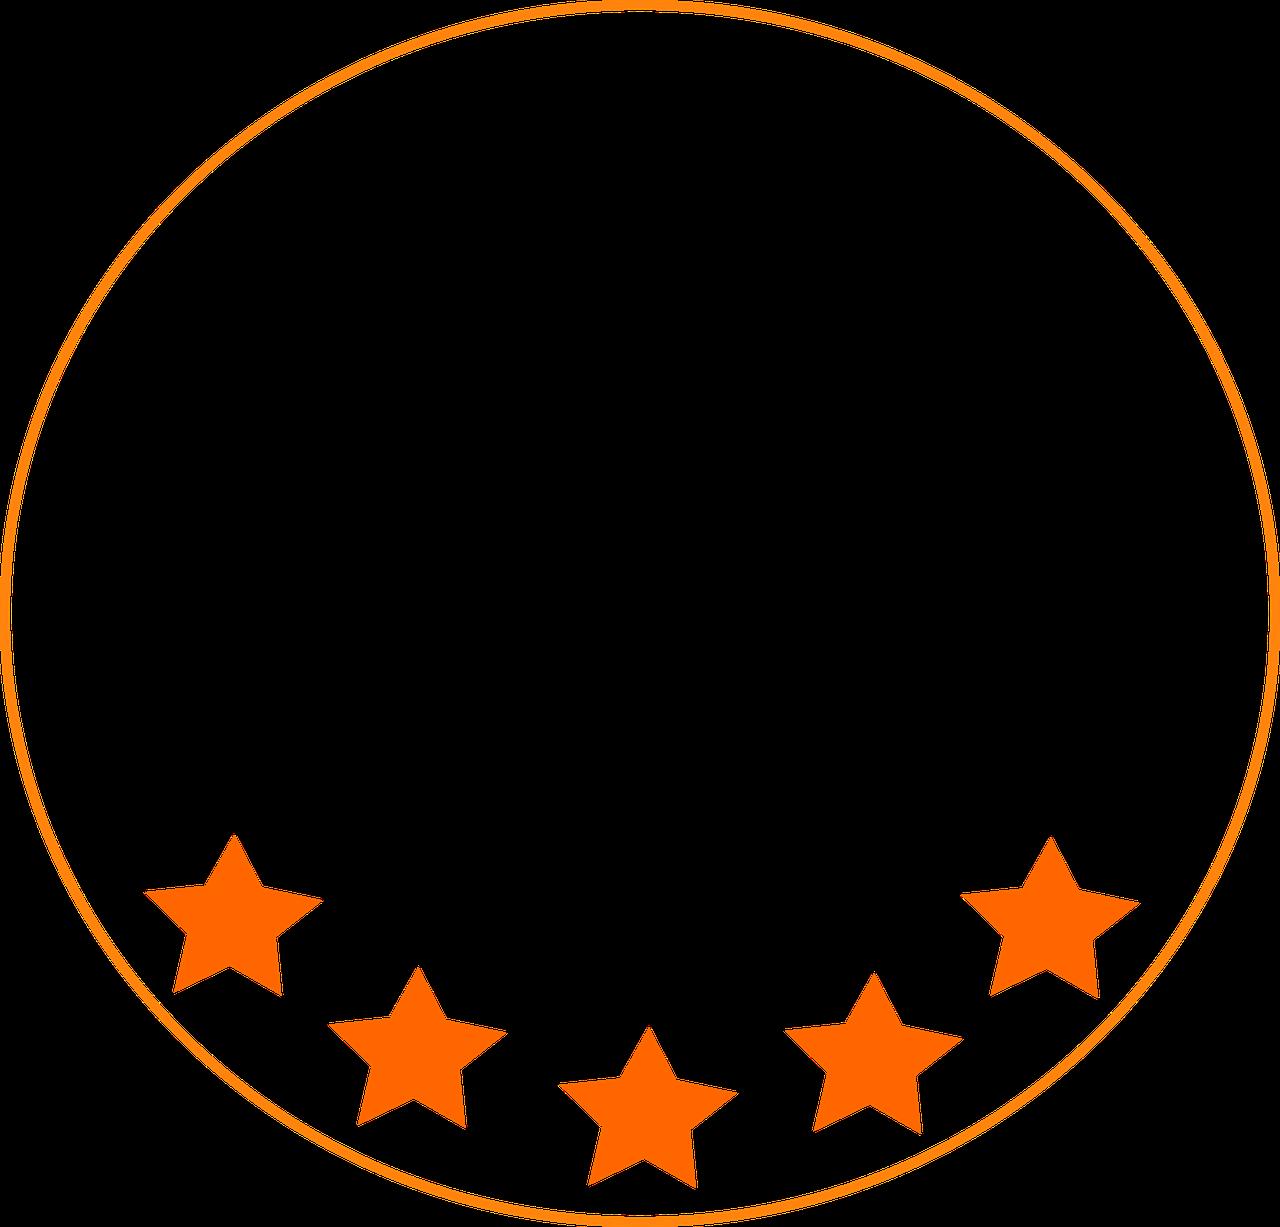 stars, five stars, logo-720213.jpg